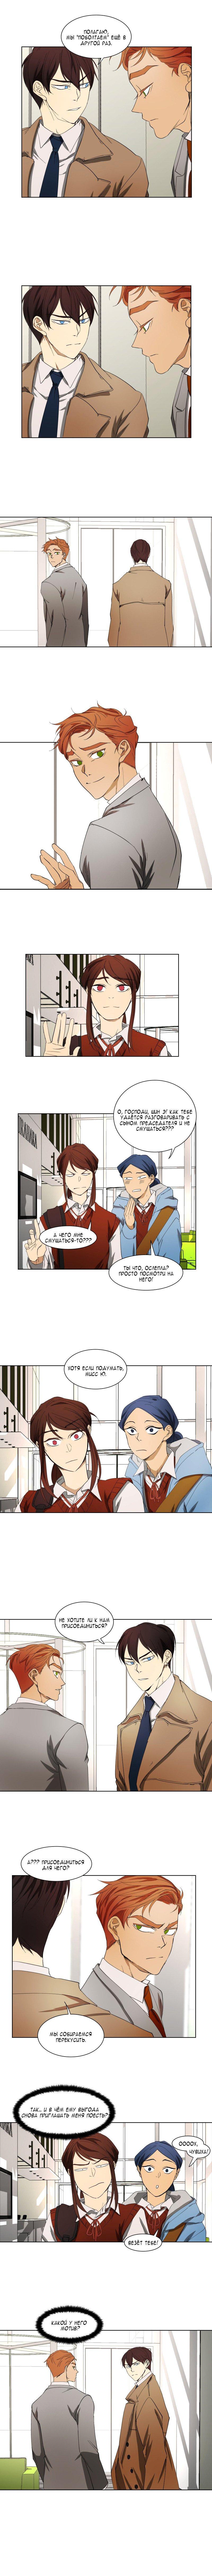 Манга Я люблю Ю / I love Yoo  - Том 1 Глава 26 Страница 2